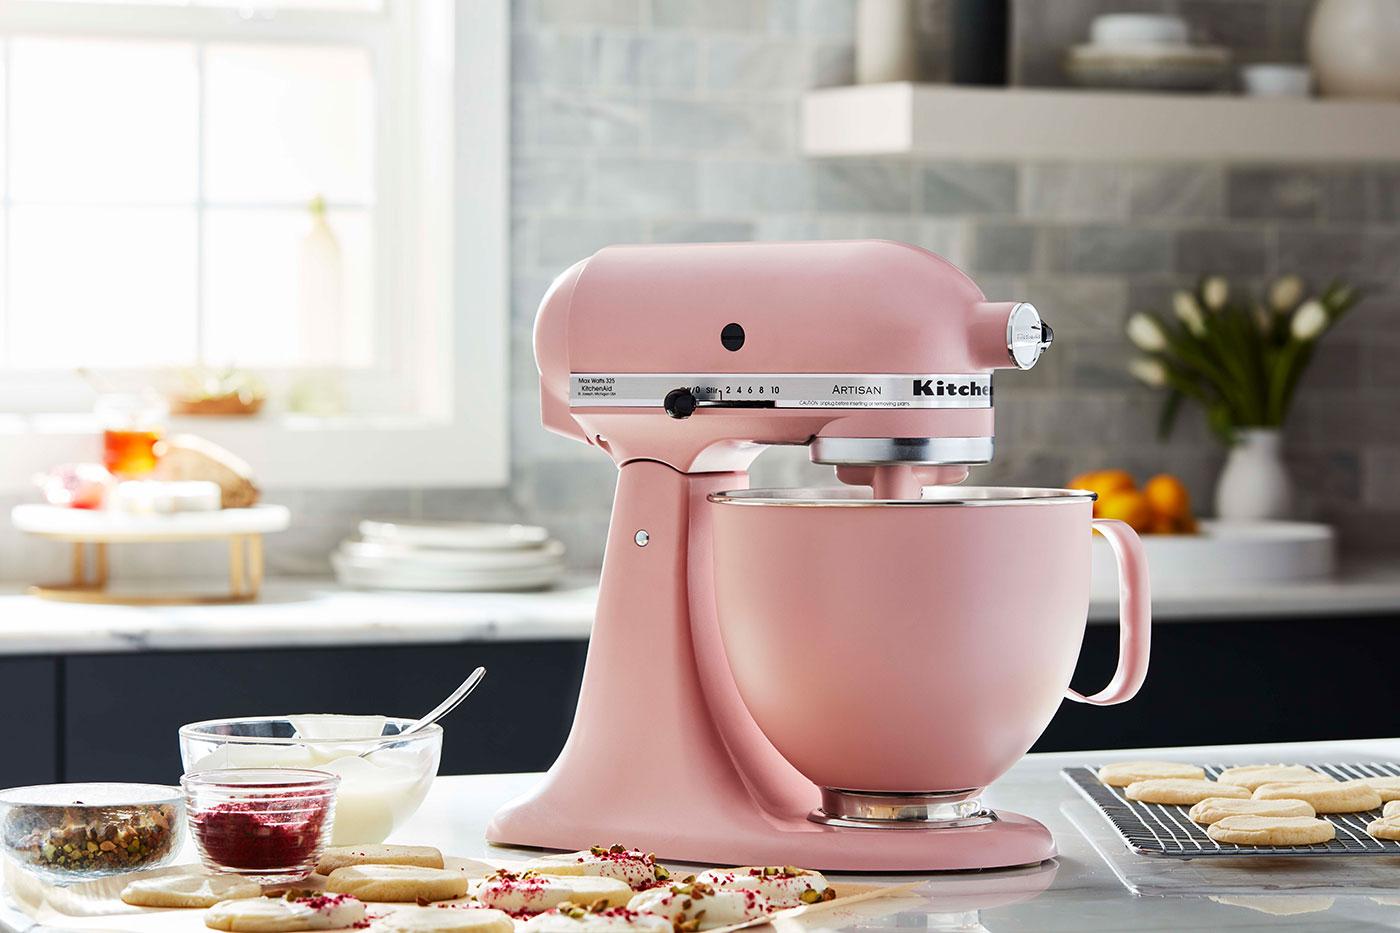 Kitchenaid Küchenmaschine Rosa 2021